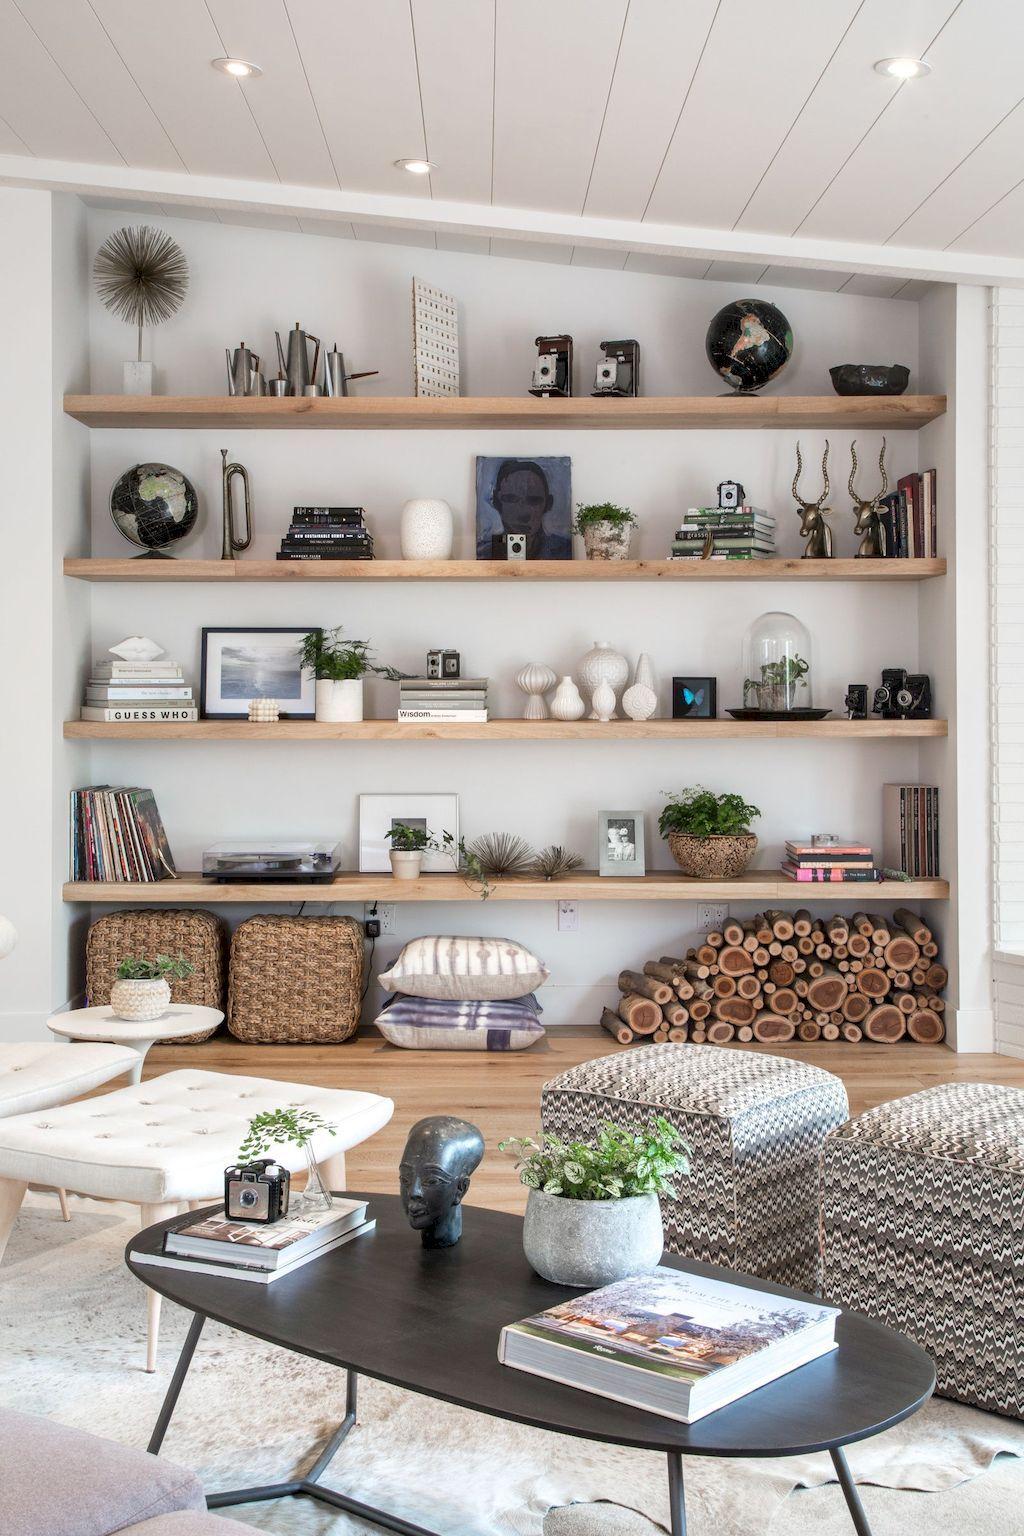 70 Cozy Small Living Room Decor Ideas on A Budget | Room ...